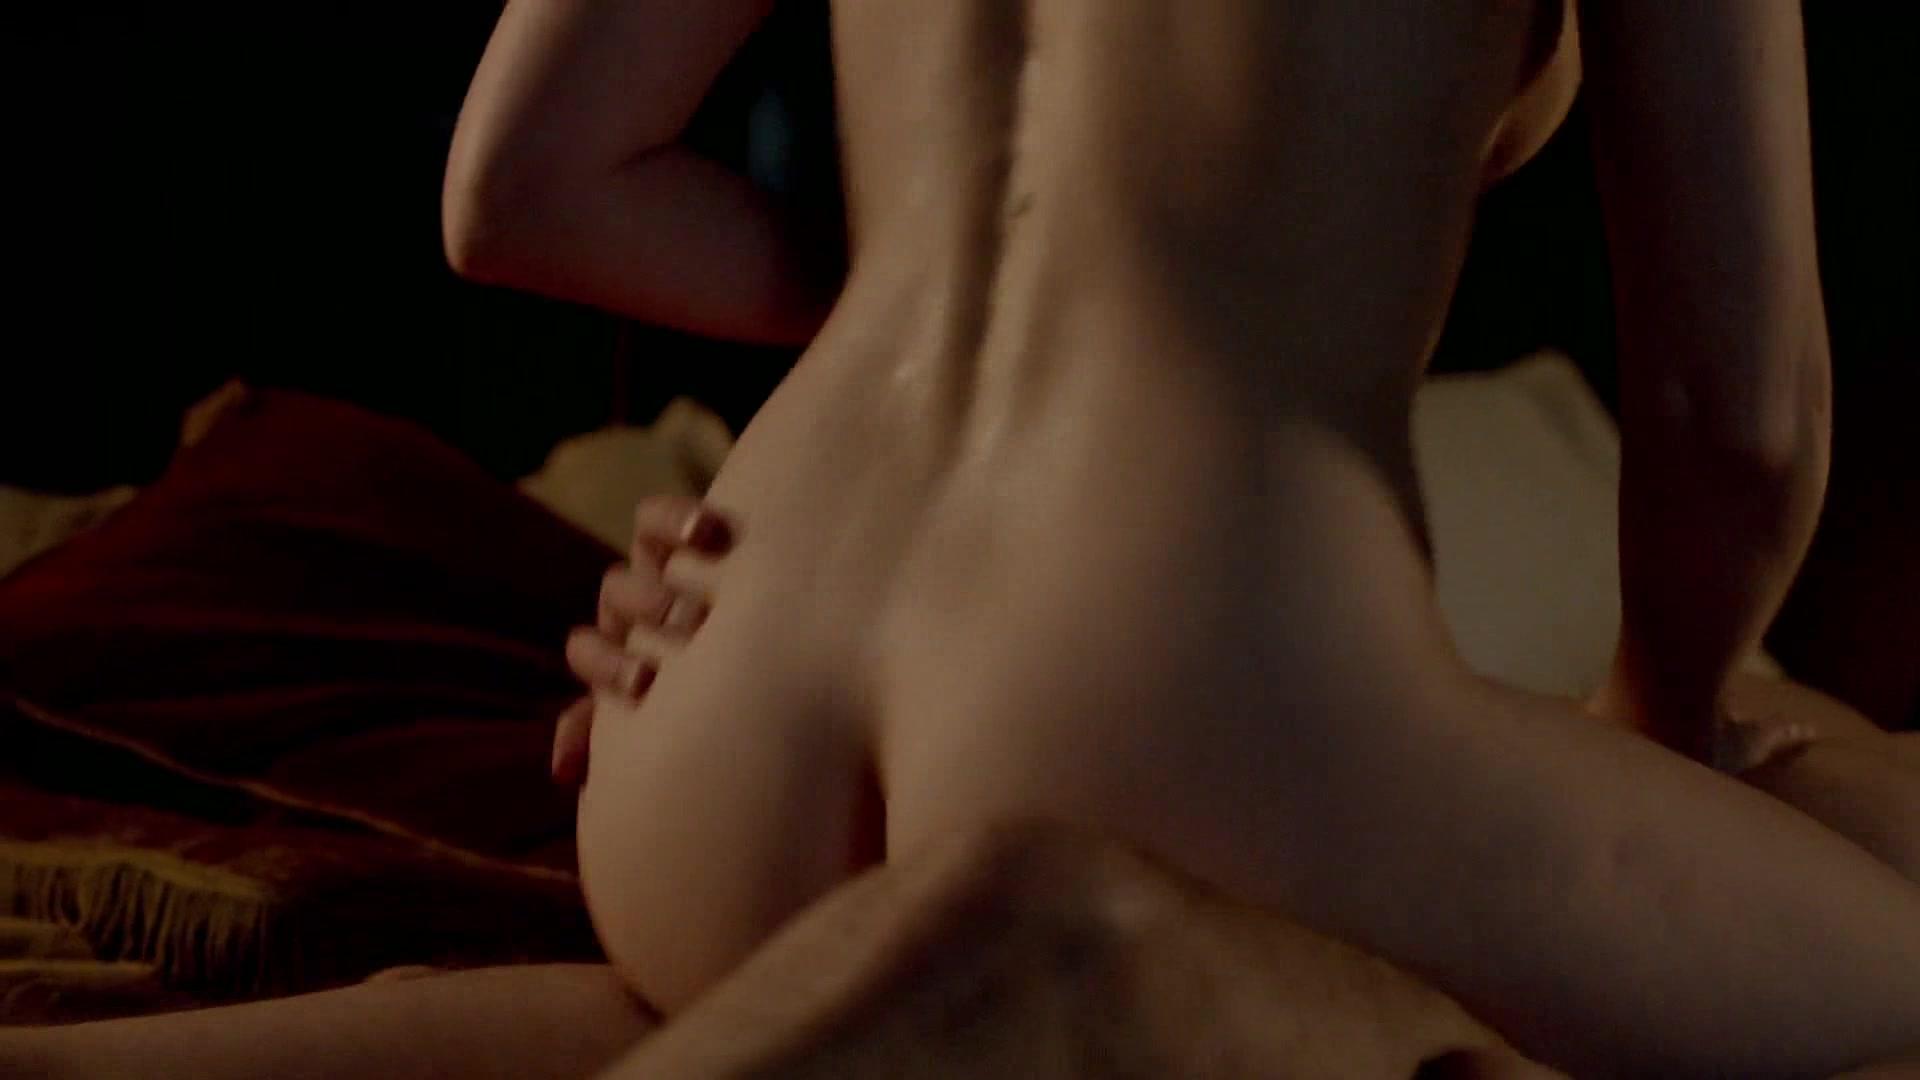 Alexandra breckenridge nude the fappening